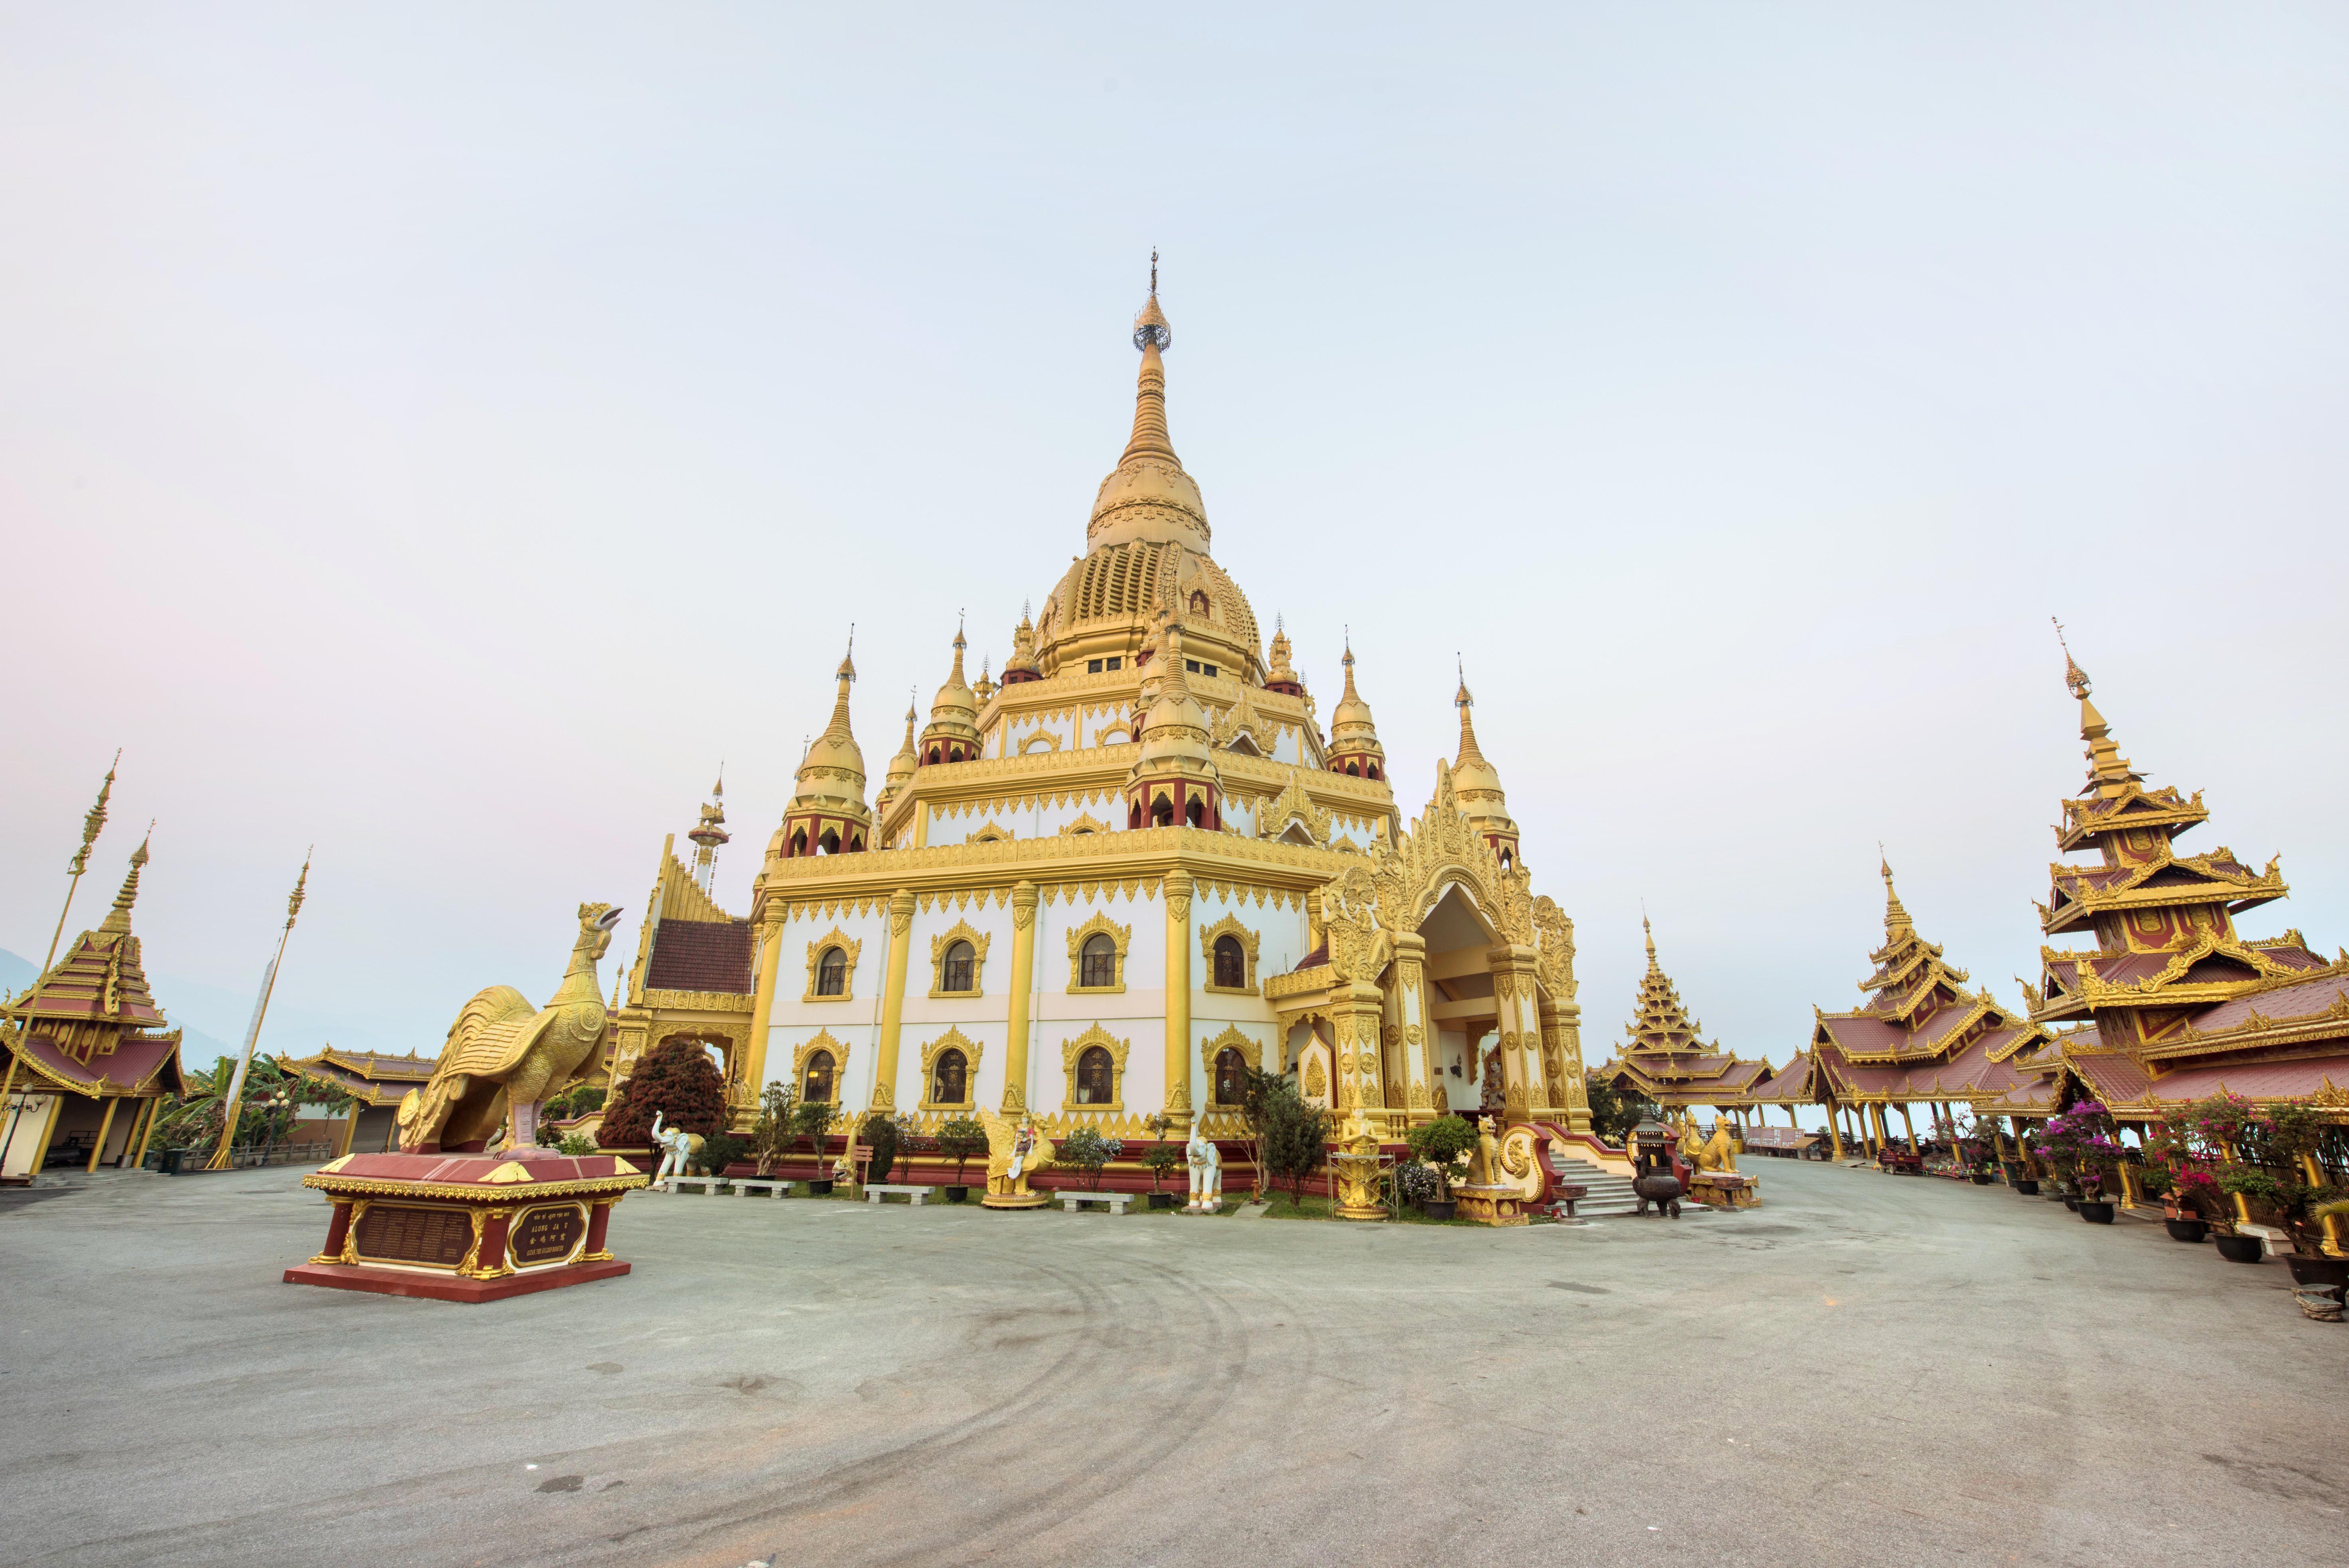 Menghuan Grand Golden Pagoda